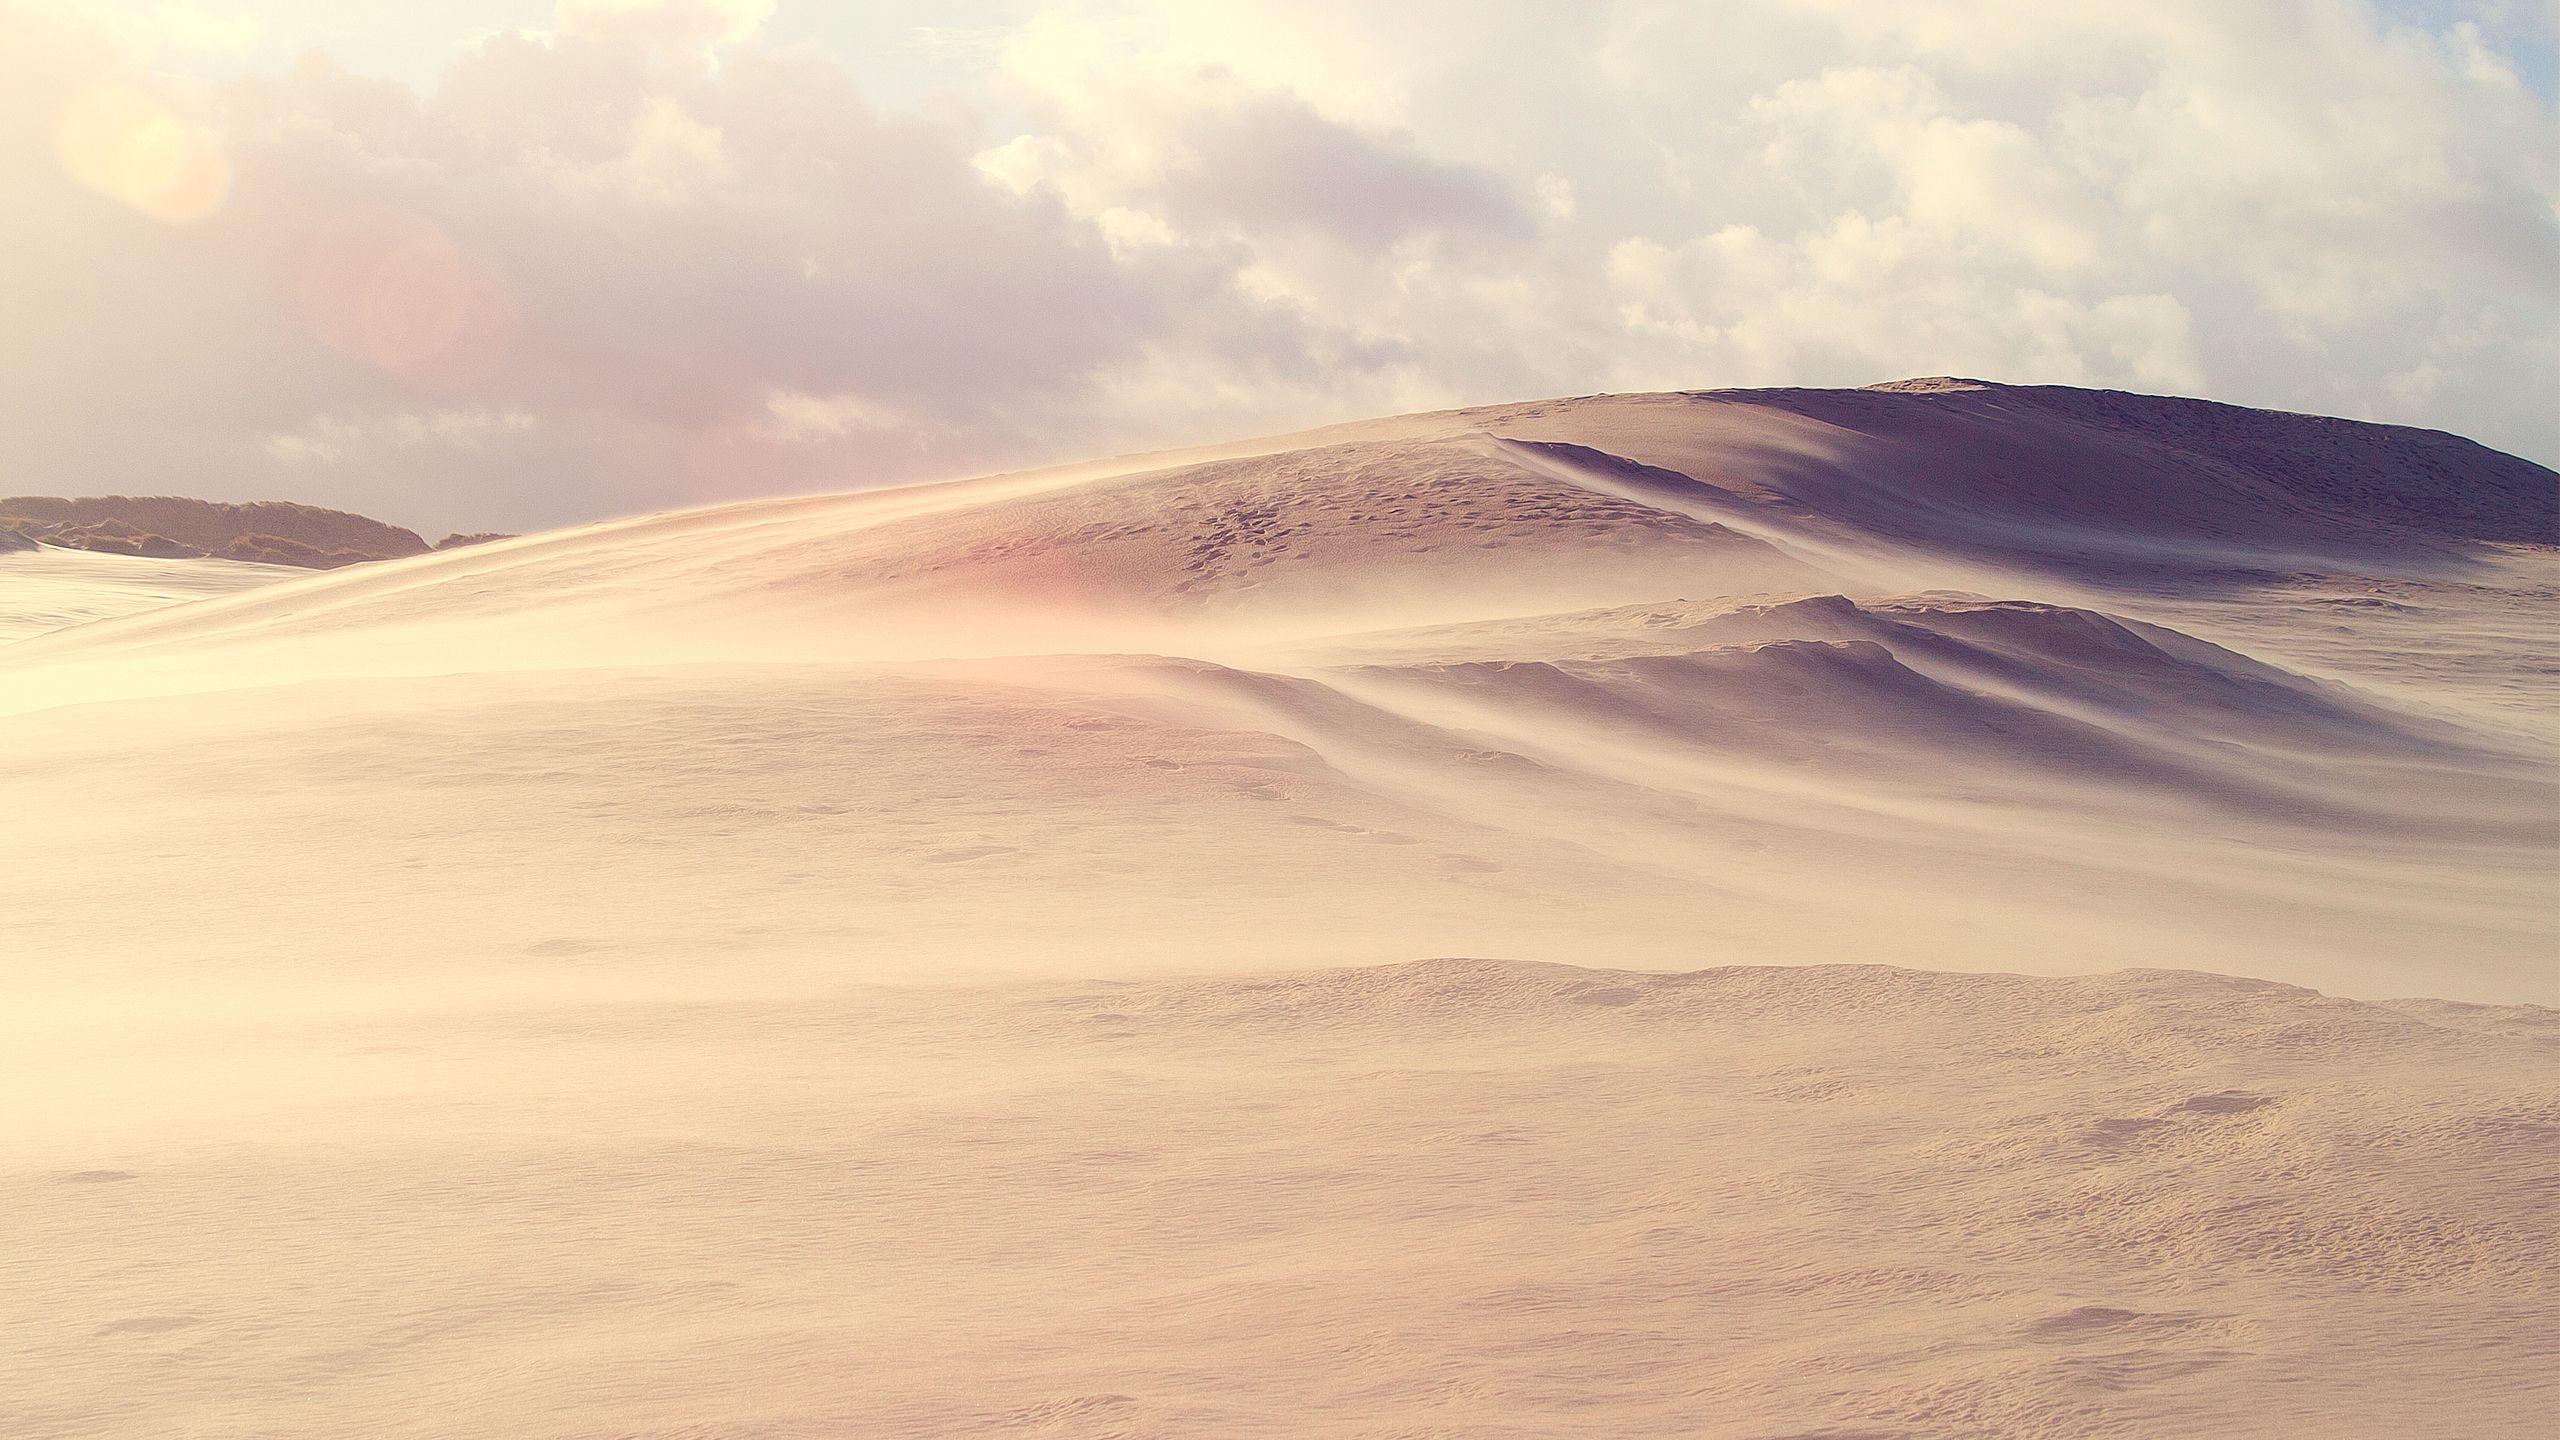 2560x1440 Desert Landscape Desktop Pc And Mac Wallpaper Desert Pictures Landscape Photos Landscape Wallpaper